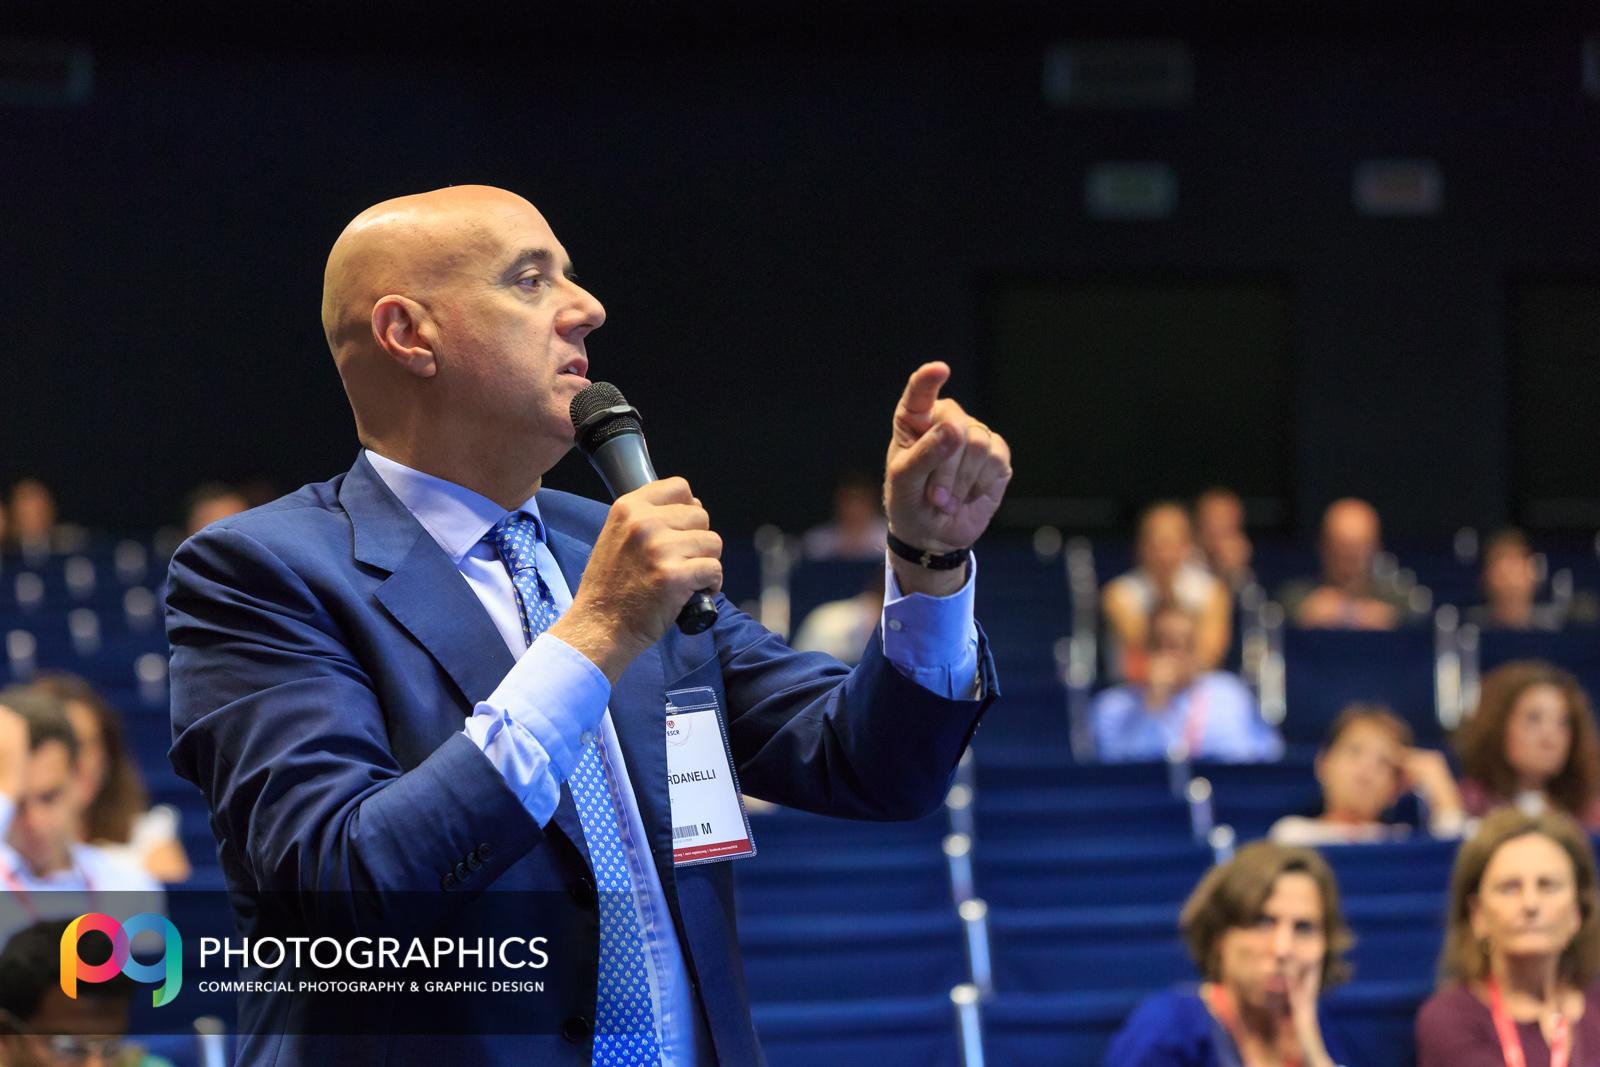 ESCR-2018-conference-event-photography-UK-glasgow-edinburgh-19.jpg